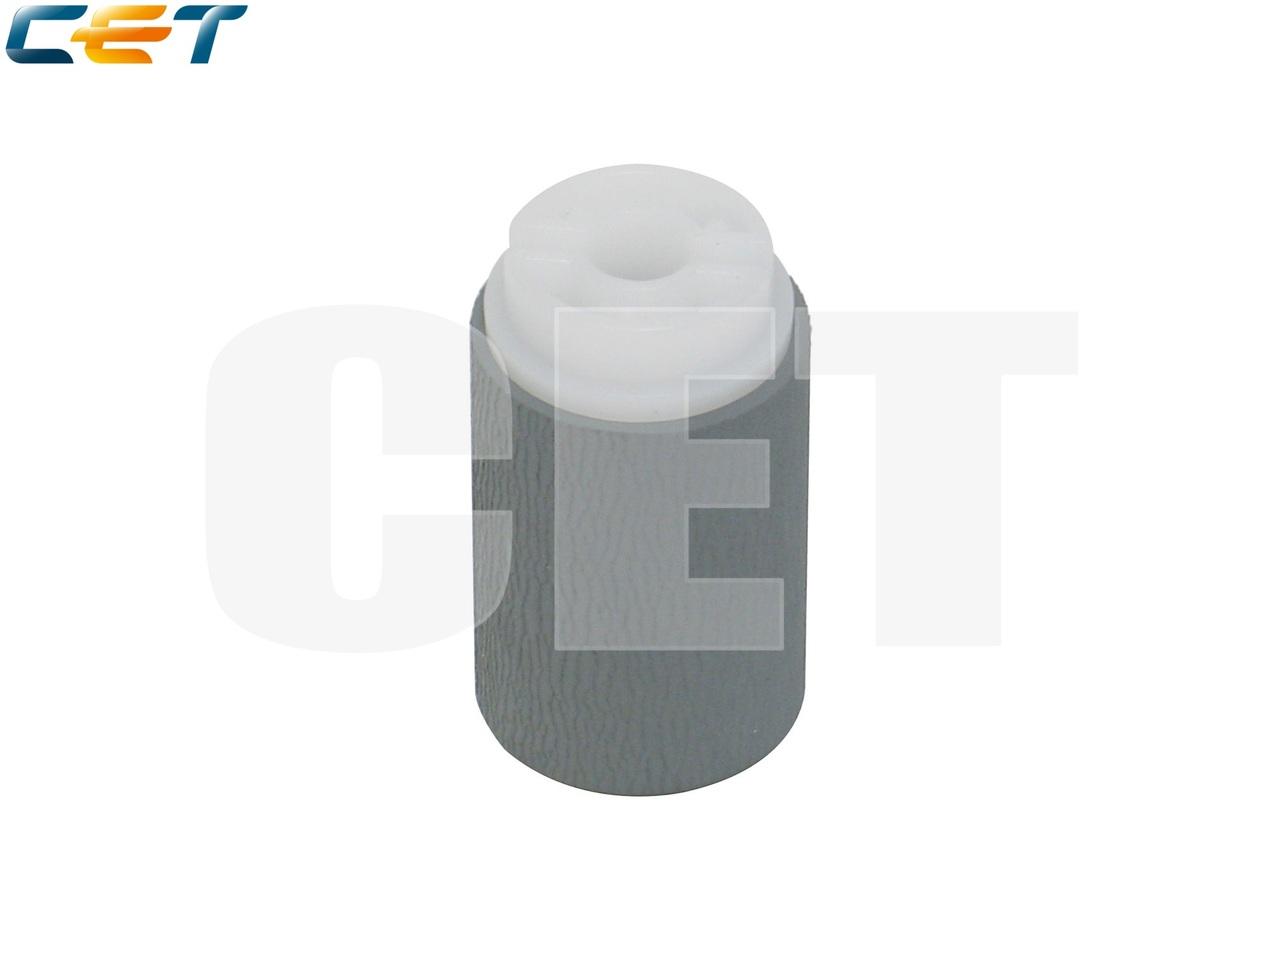 Ролик подачи 4401964410, 6LE69833000, 41304048000 дляTOSHIBA E-Studio 168/208/258, DP1600/2000/2500 (CET),CET7779